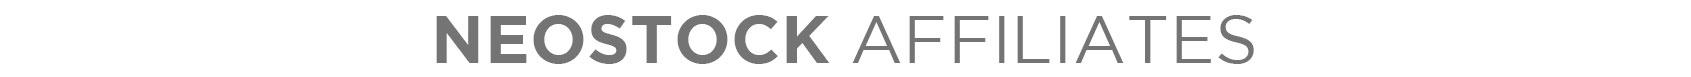 neostock affiliates page affiliates title